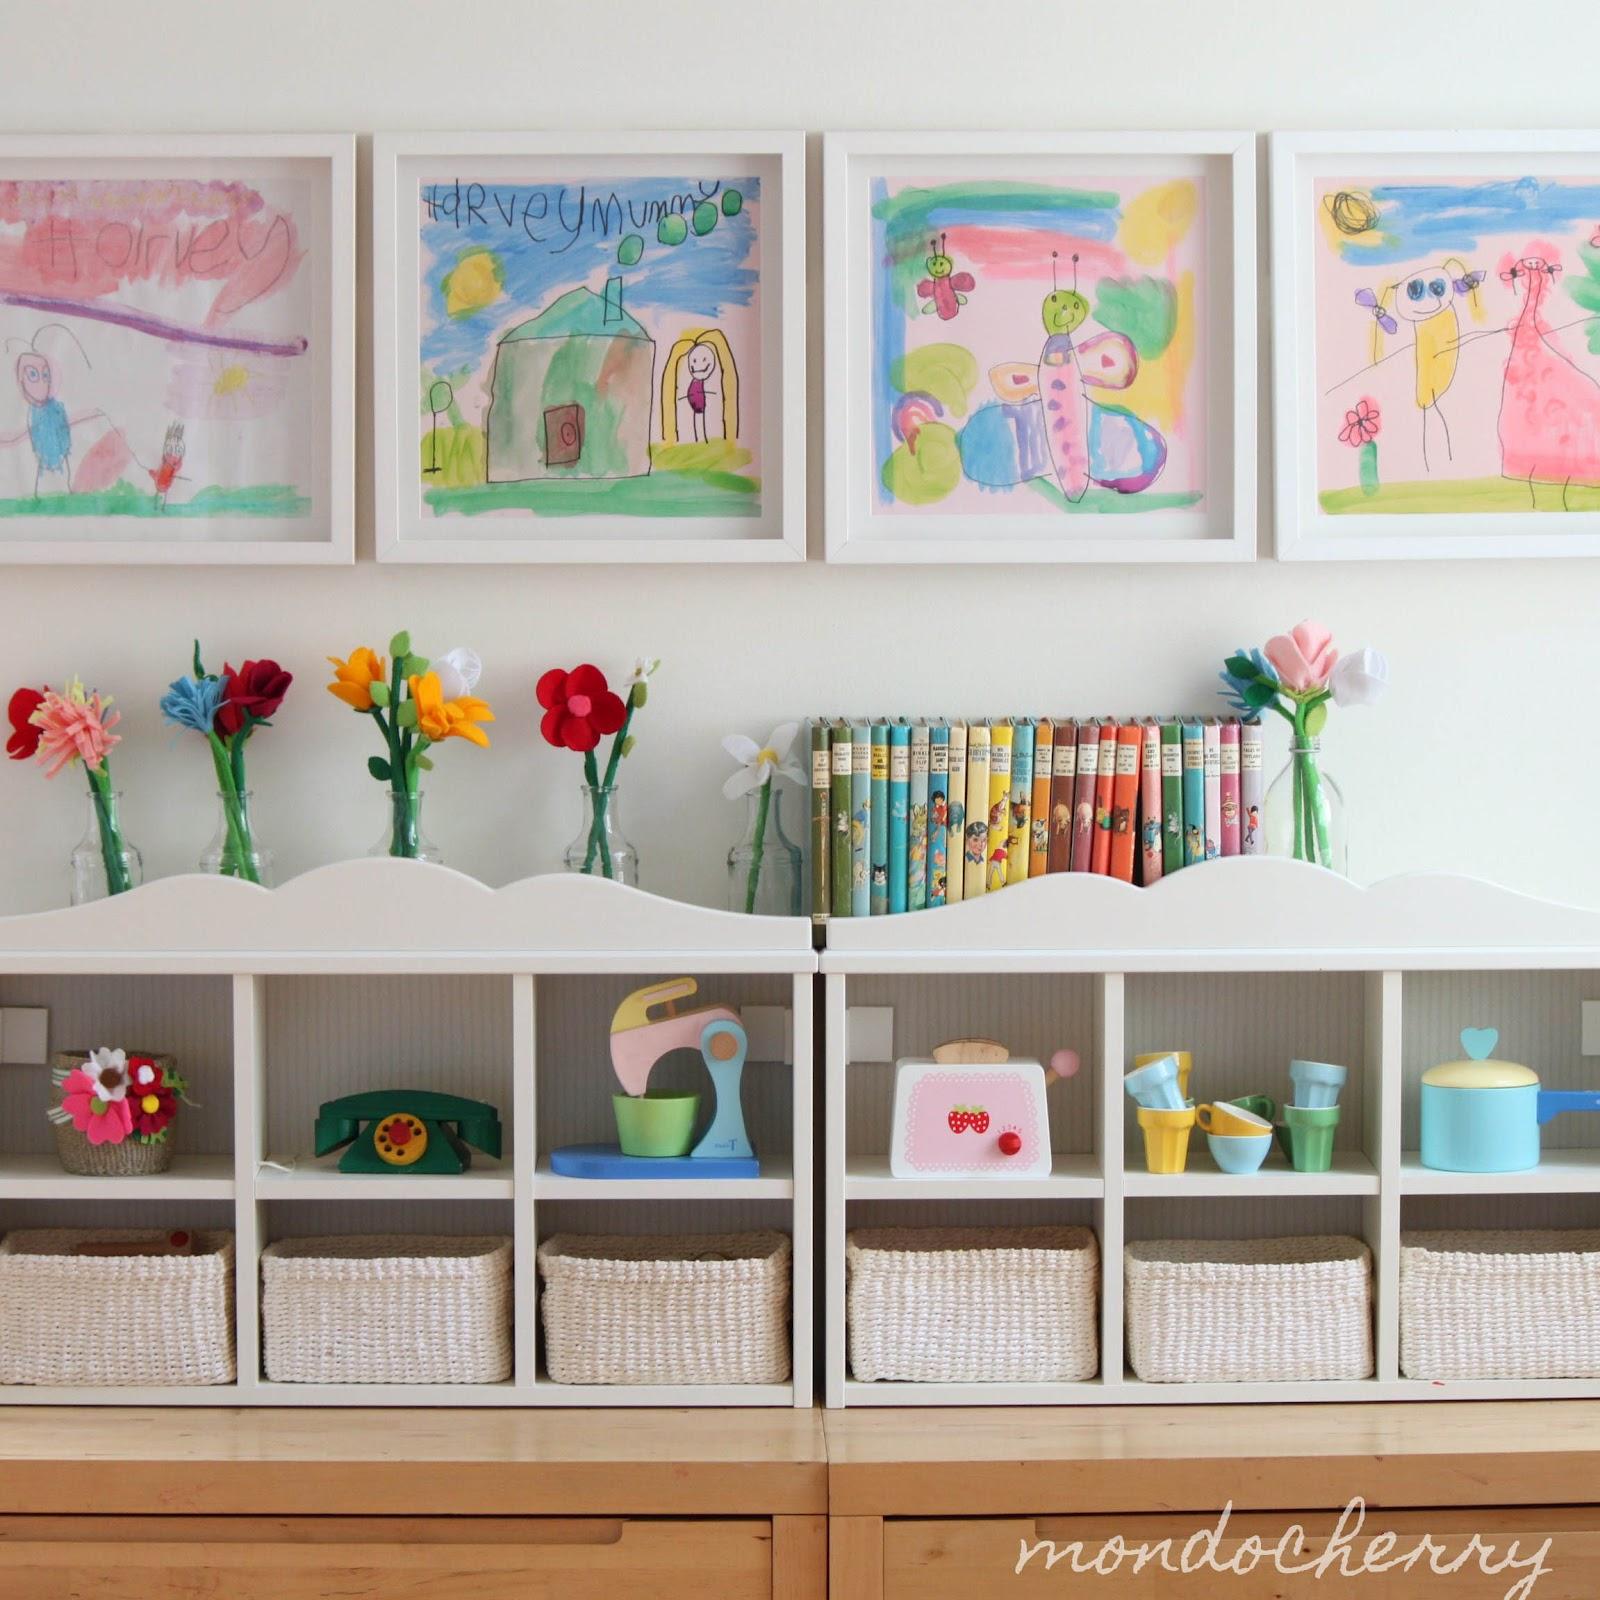 Mondocherry-Whitewash-Childs-room-storage-colorful-prints-and-pop-flowers